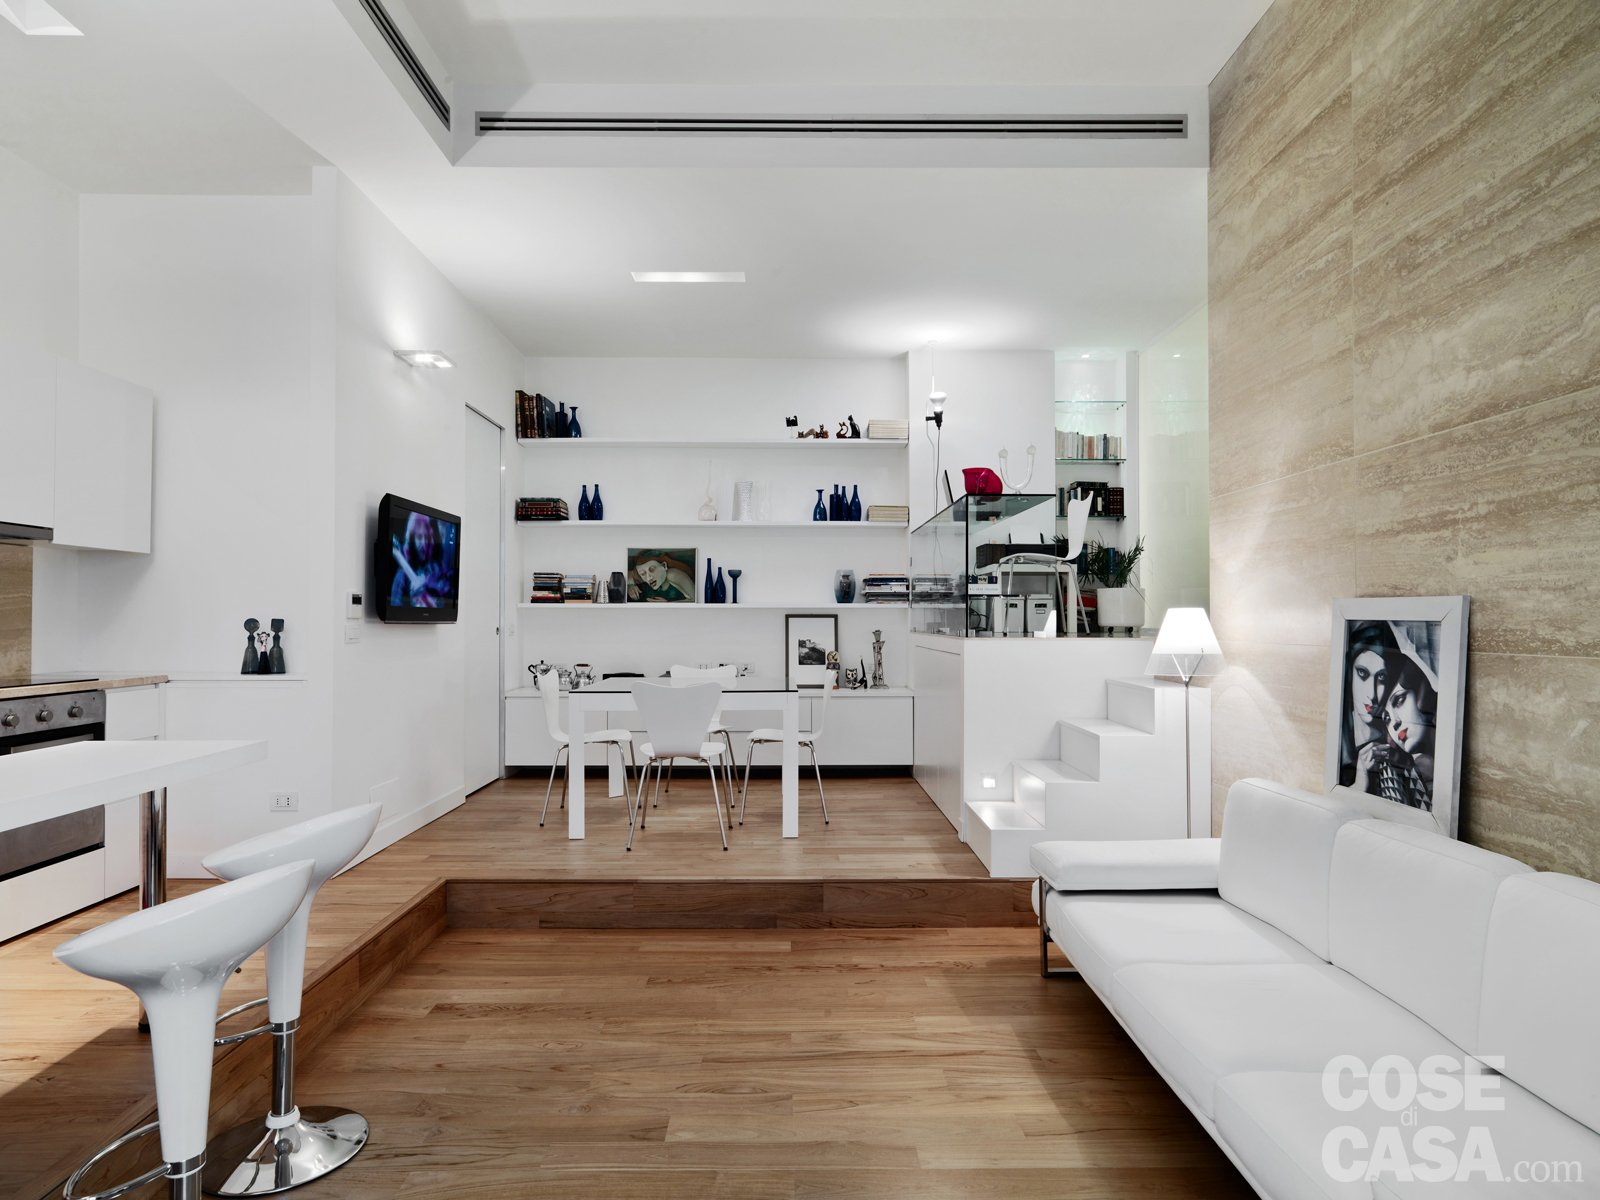 58 mq una casa sviluppata su pi livelli cose di casa